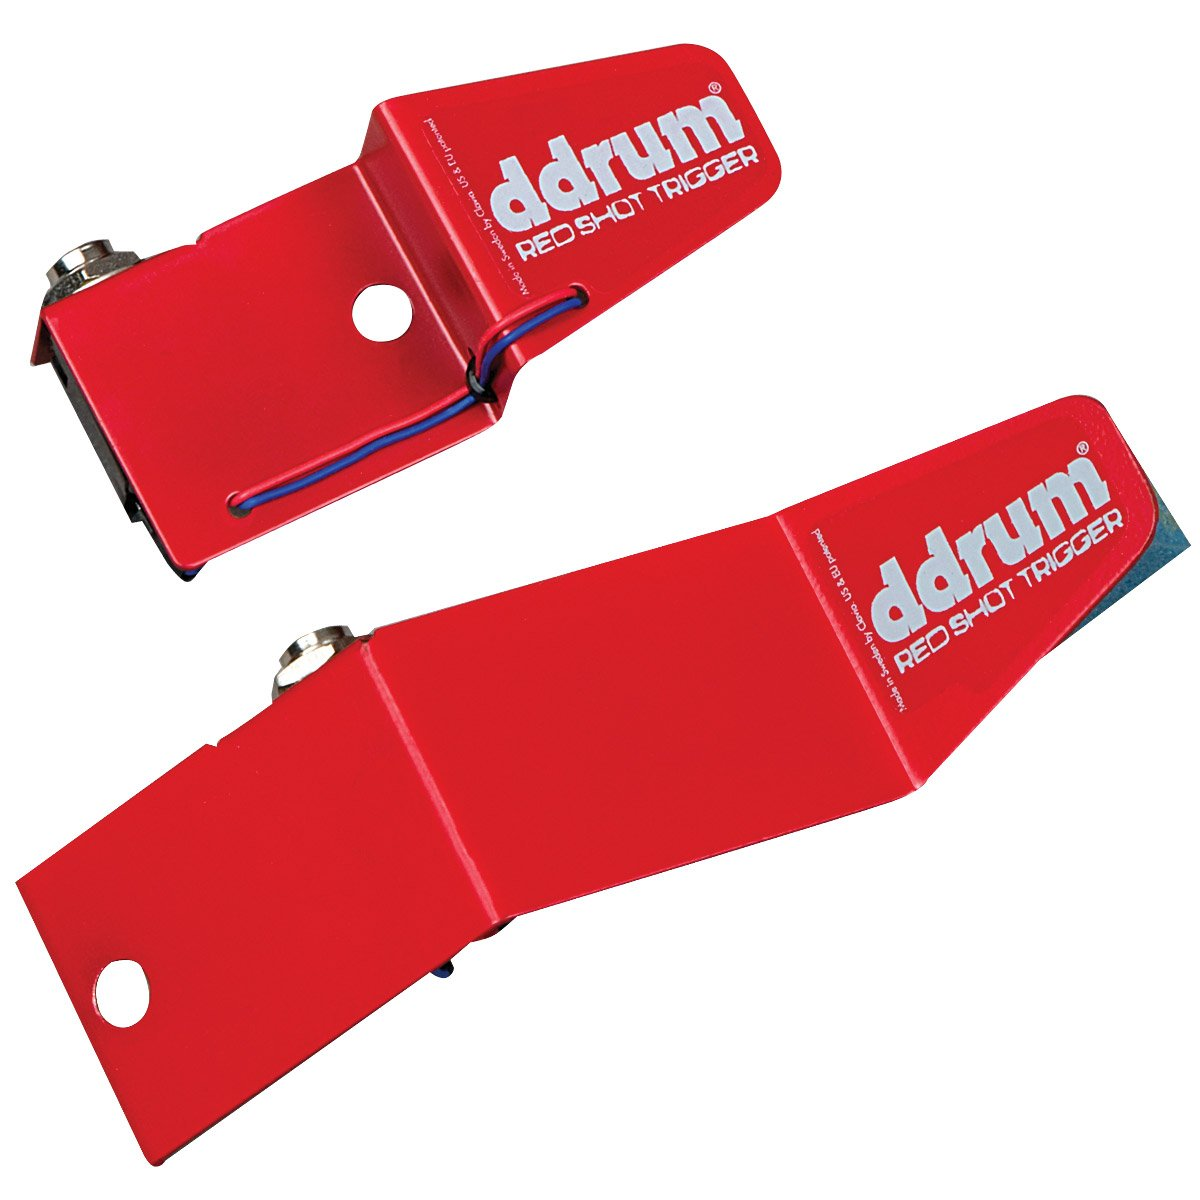 ddrum Red Shot 5-Piece Drum Trigger Kit by Ddrum